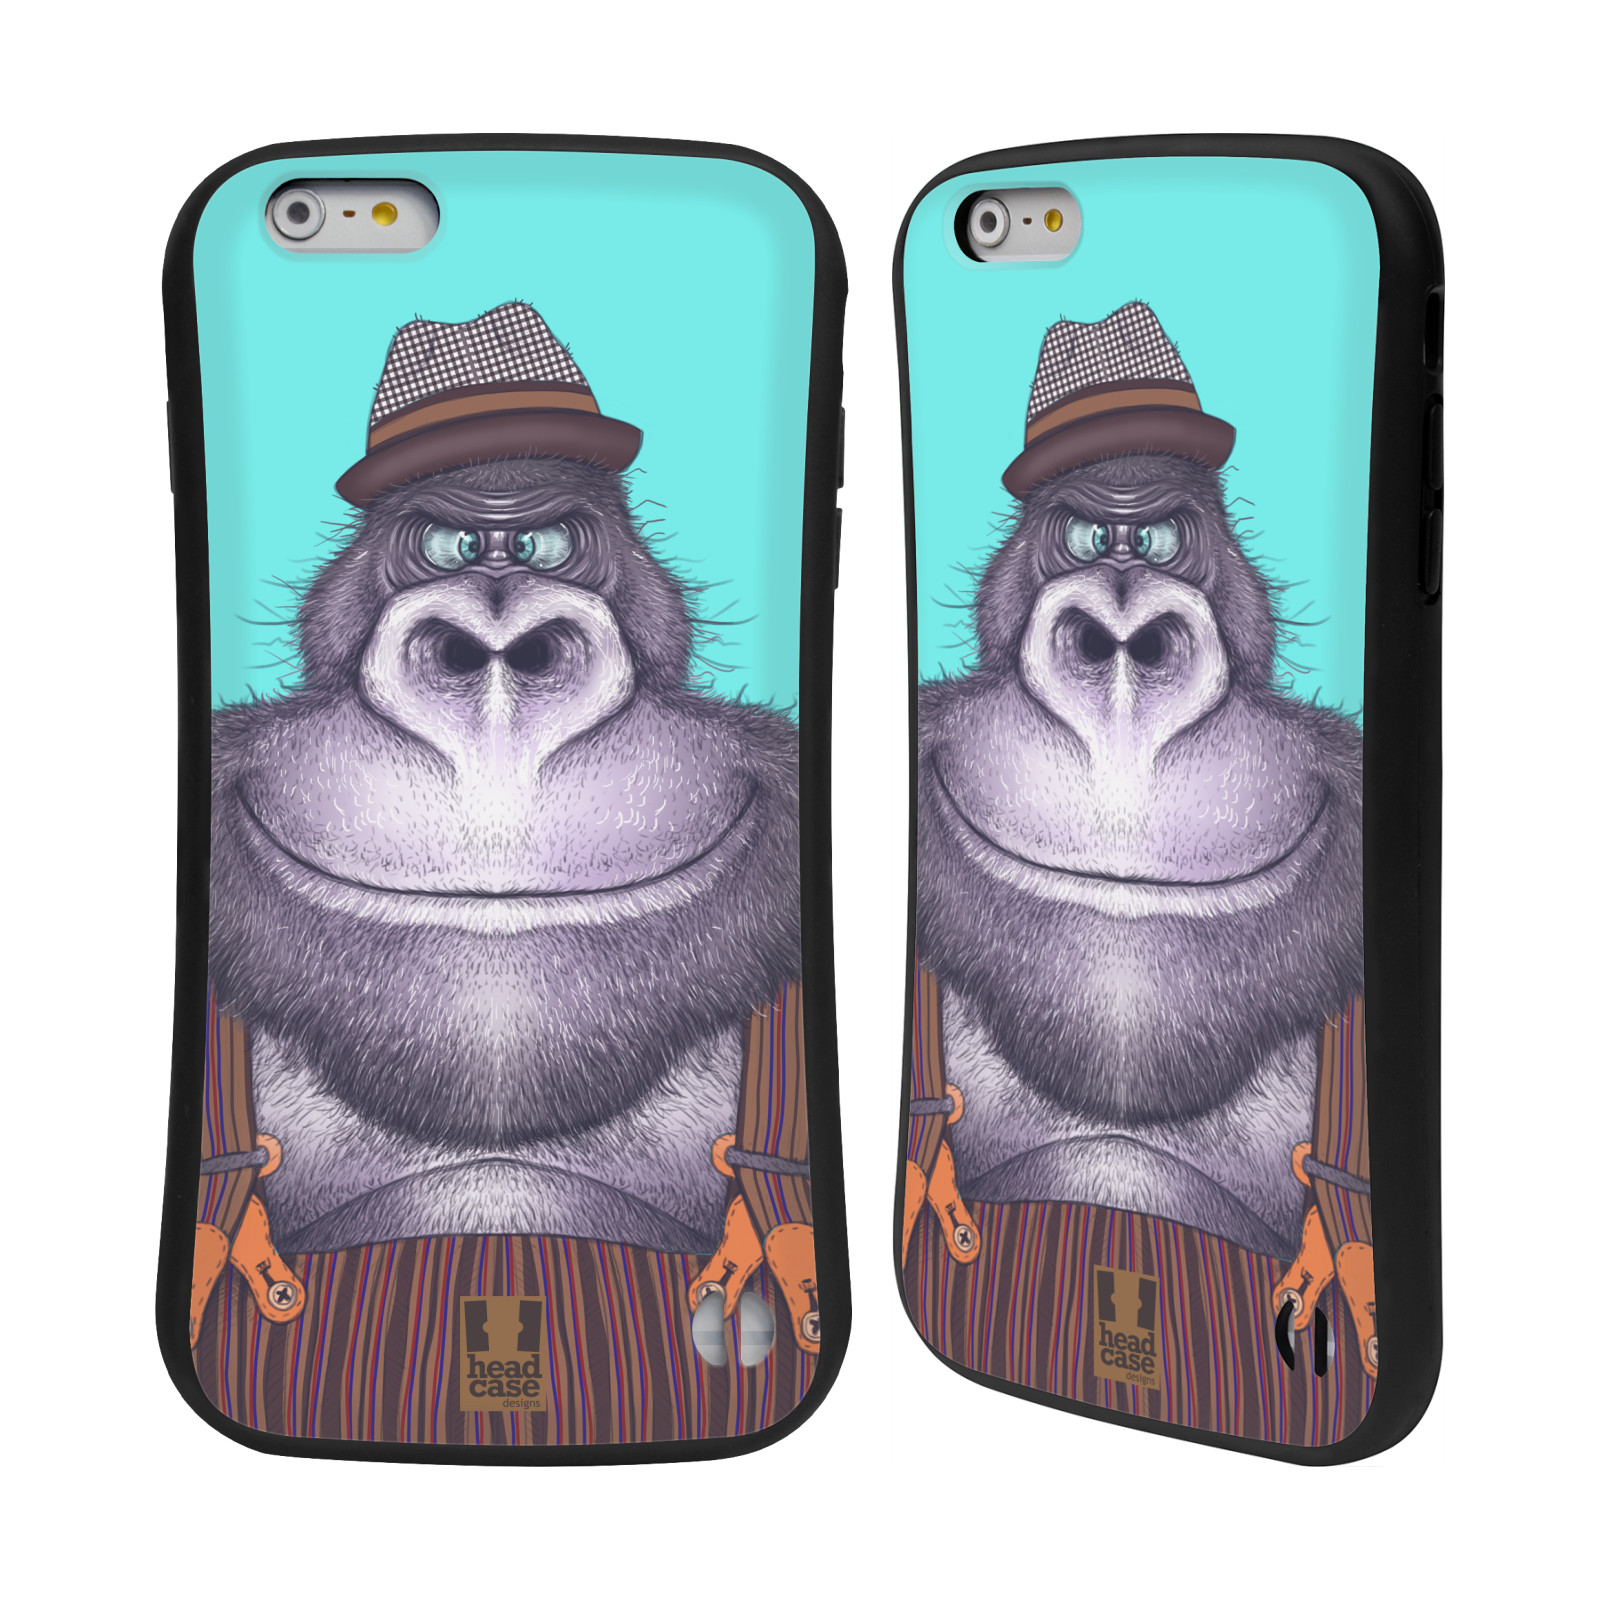 HEAD CASE silikon/plast odolný obal na mobil Apple Iphone 6 PLUS / 6S PLUS vzor Kreslená zvířátka gorila